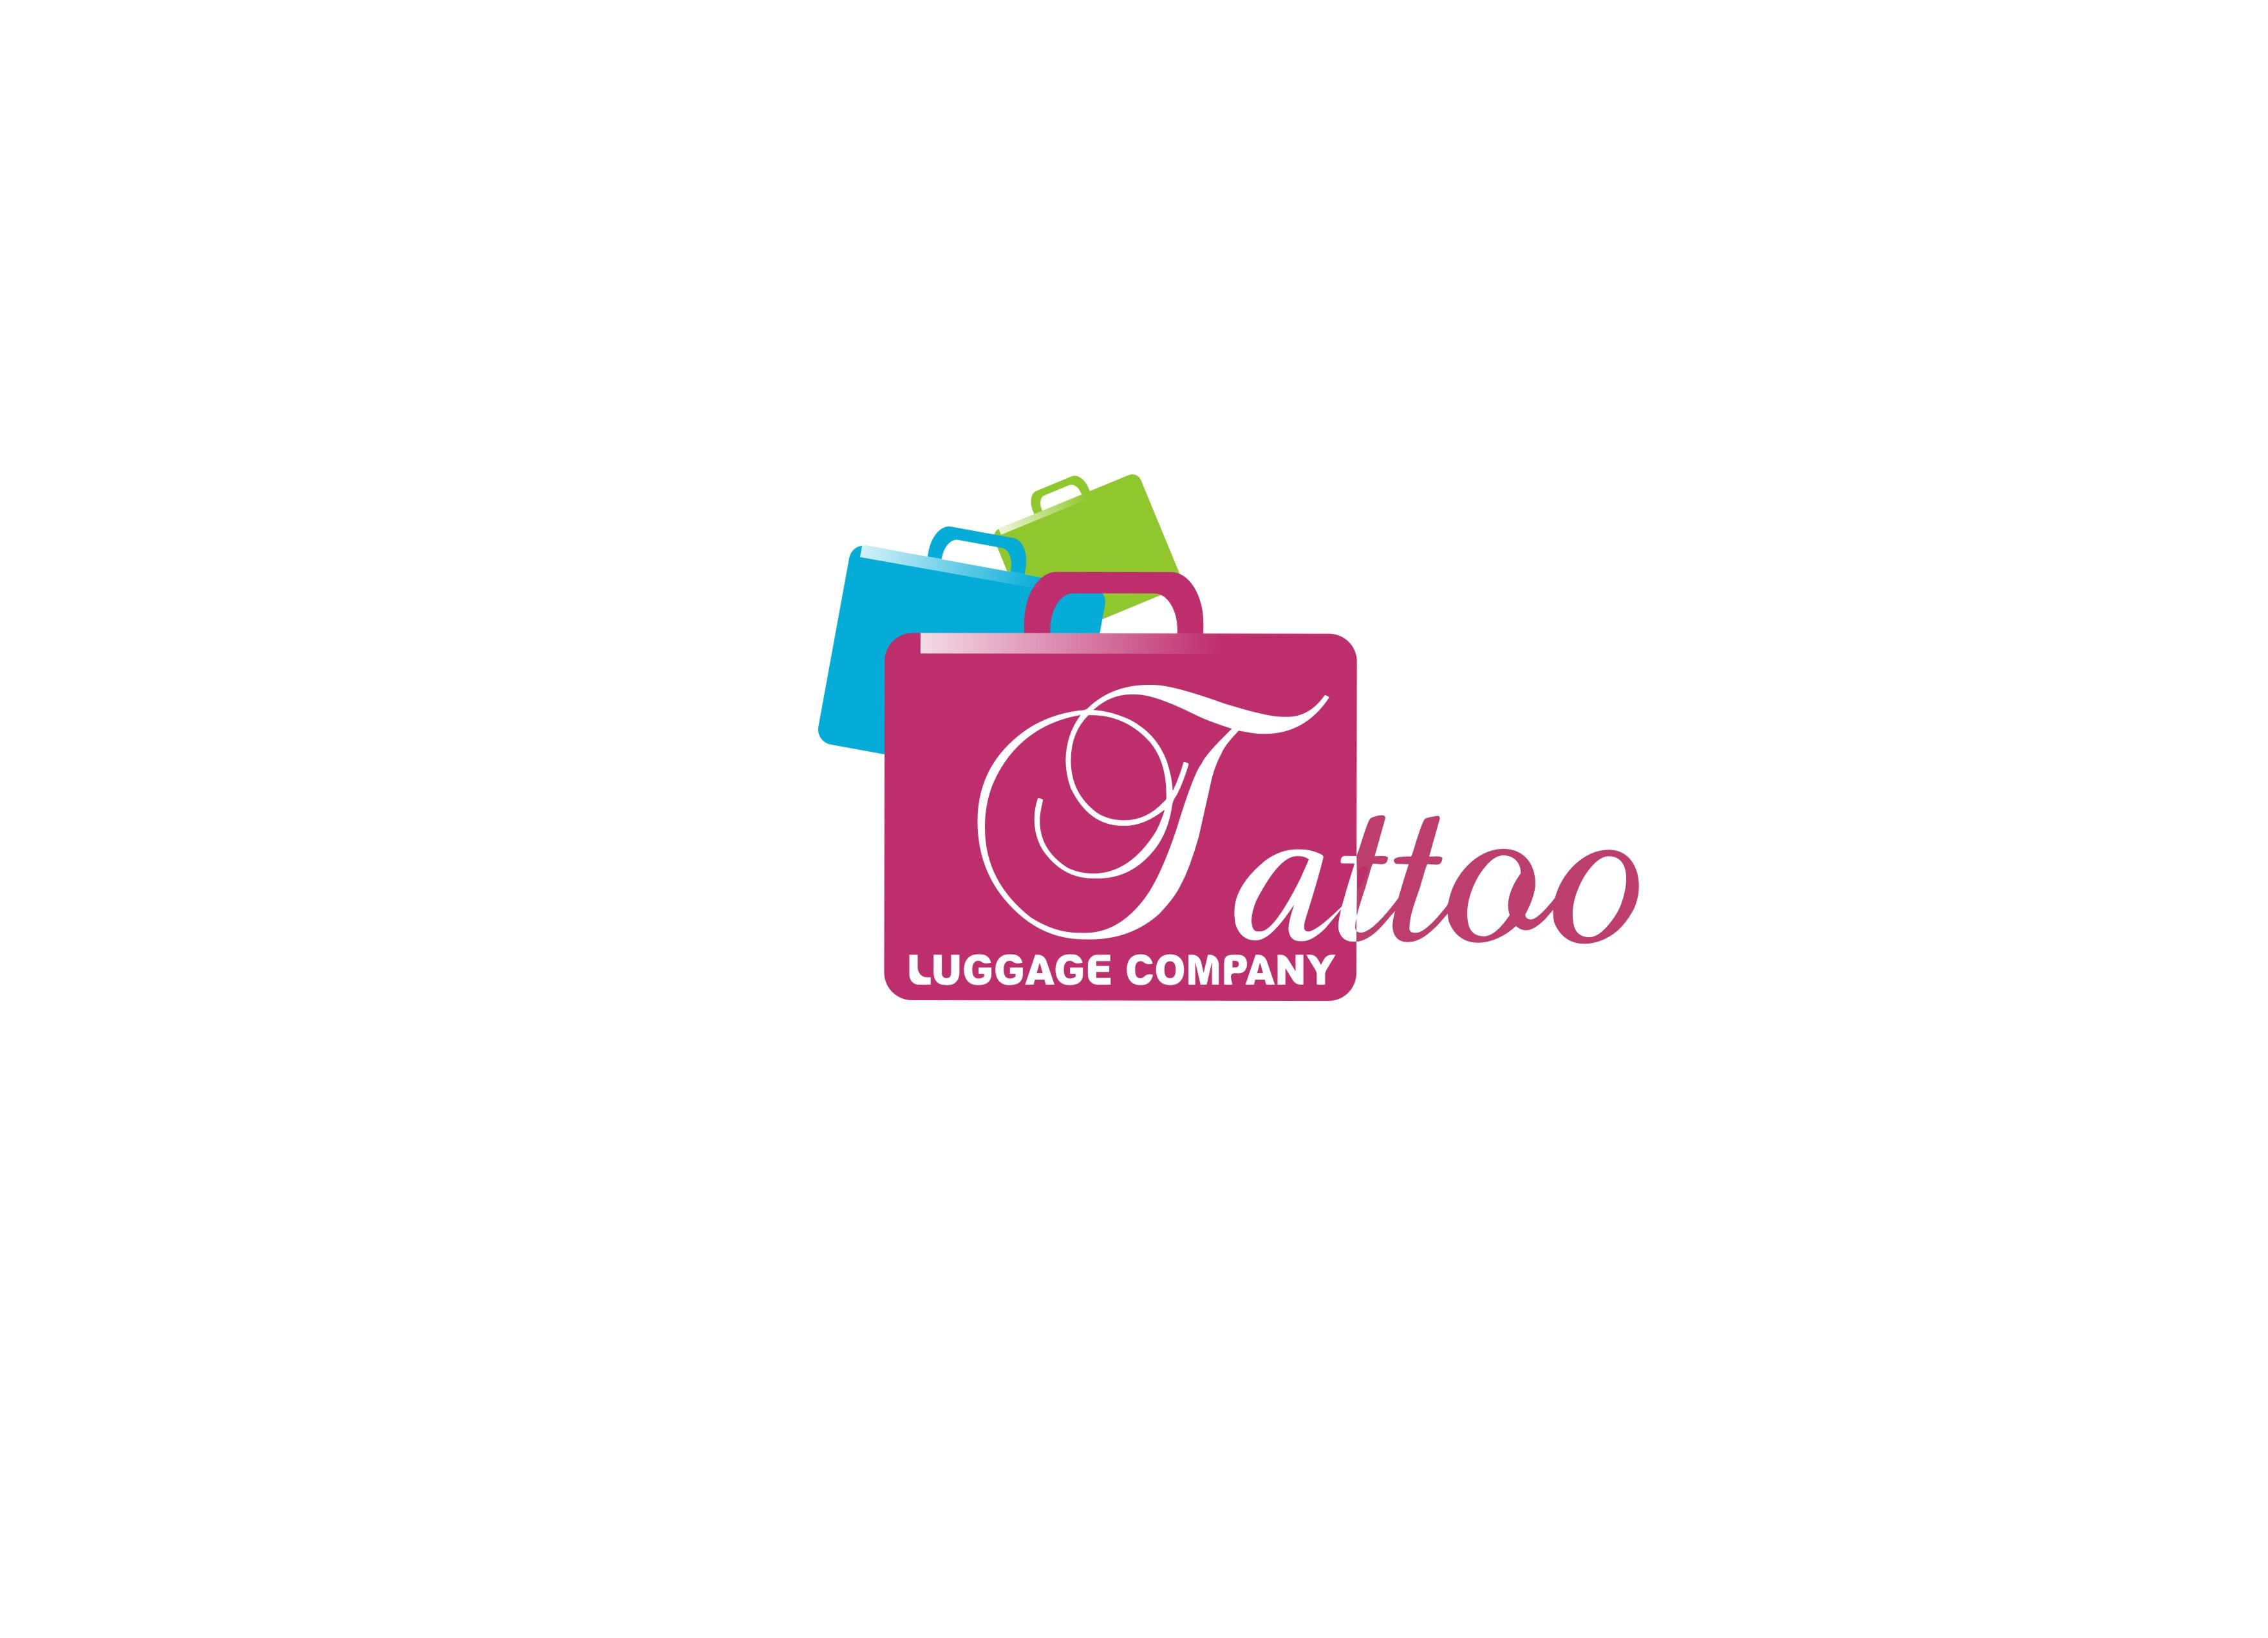 Logo Design by Kostas Vasiloglou - Entry No. 25 in the Logo Design Contest Artistic Logo Design for Tattoo Luggage Company.